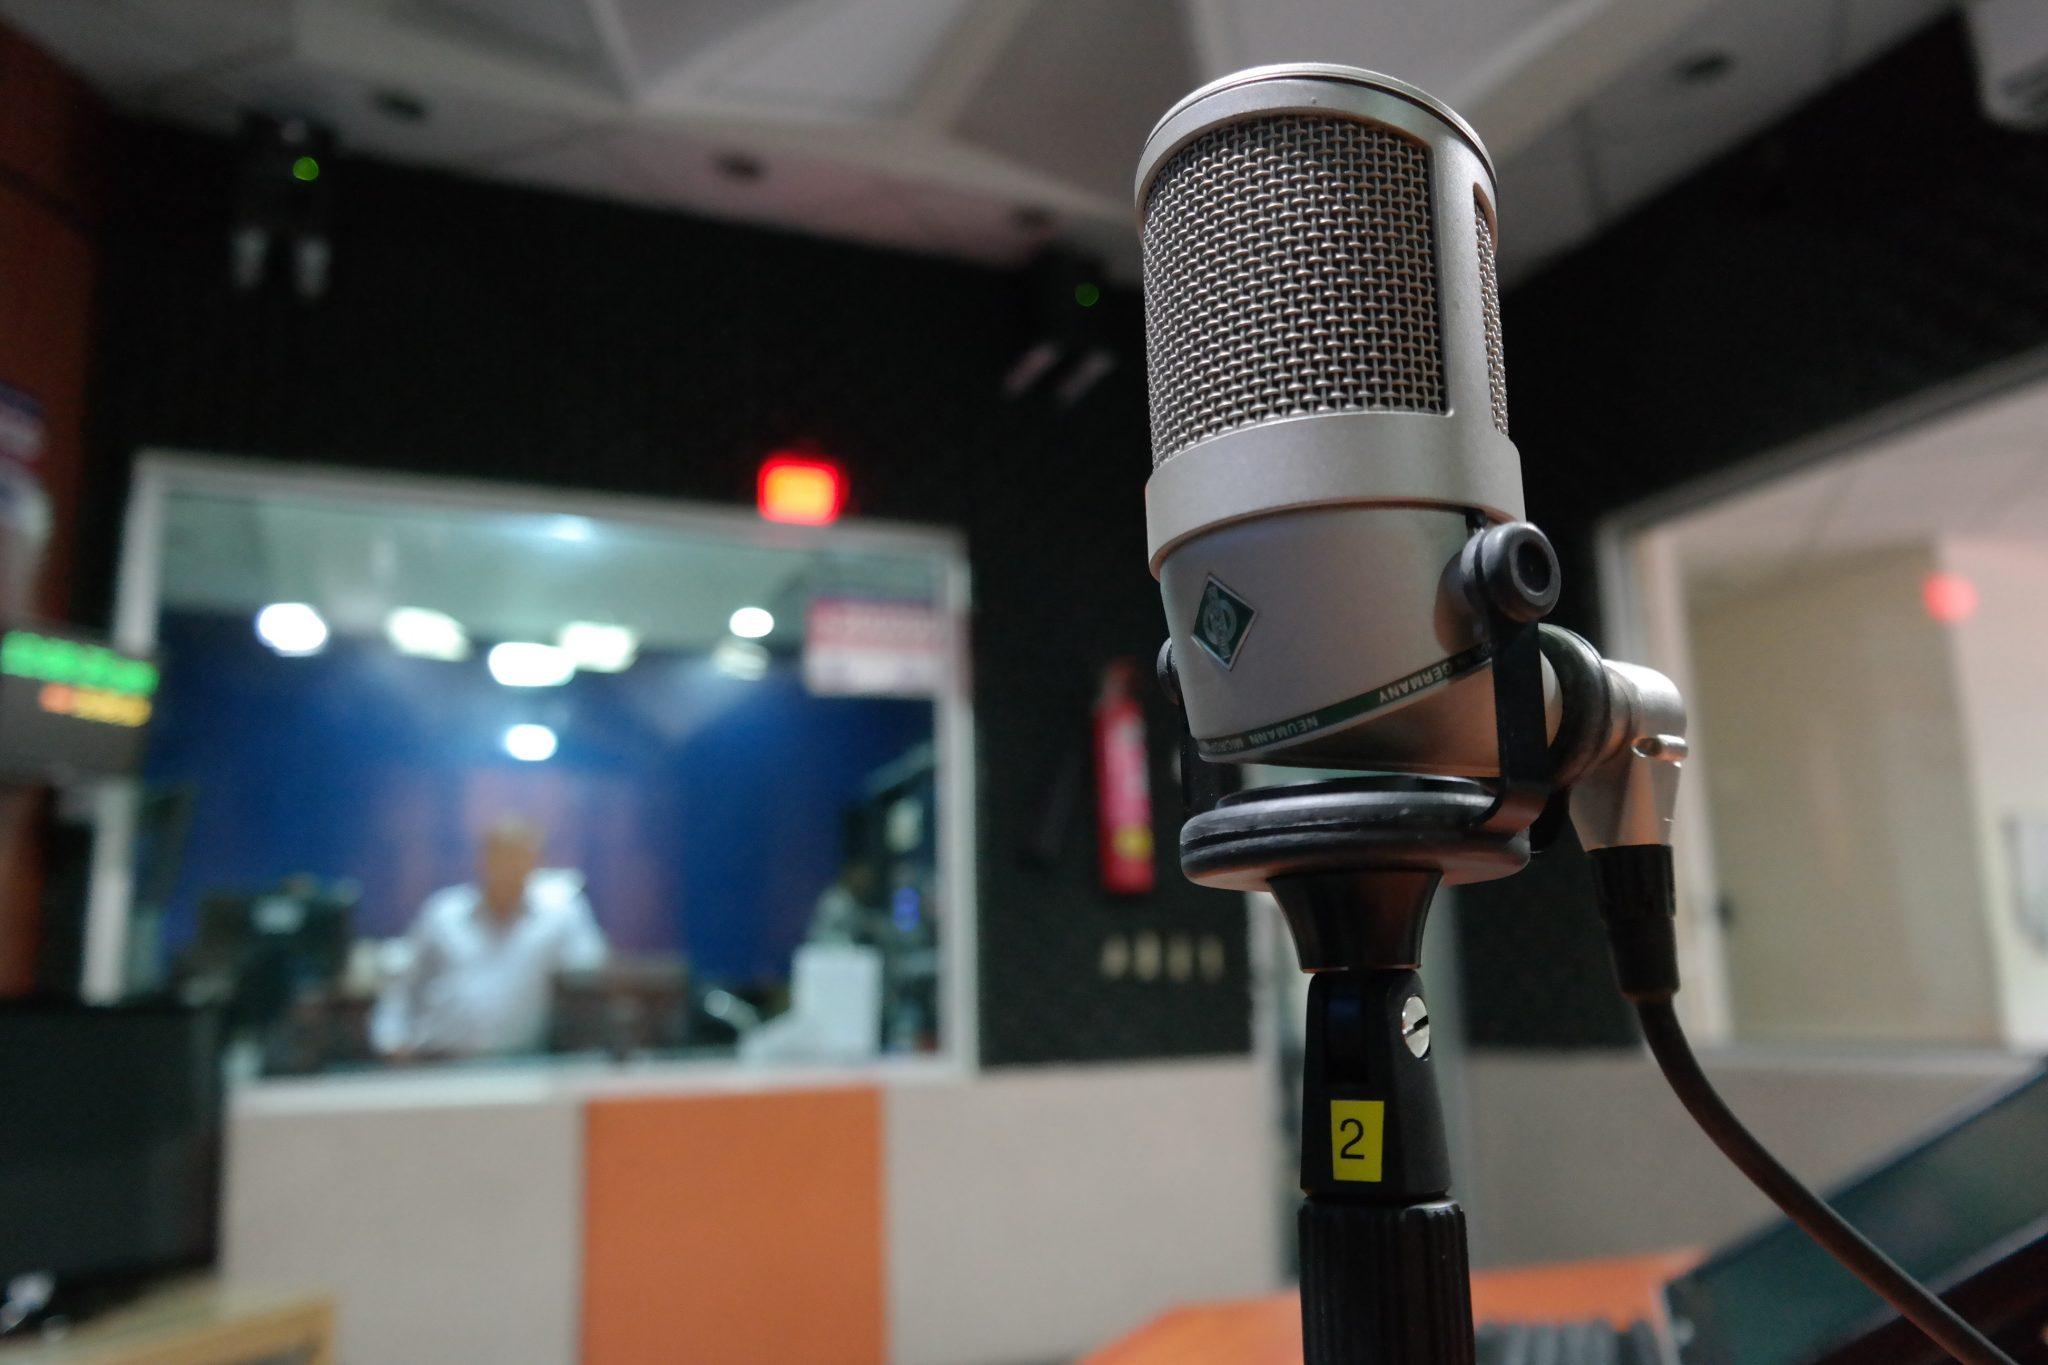 Grey condenser microphone in recording studio